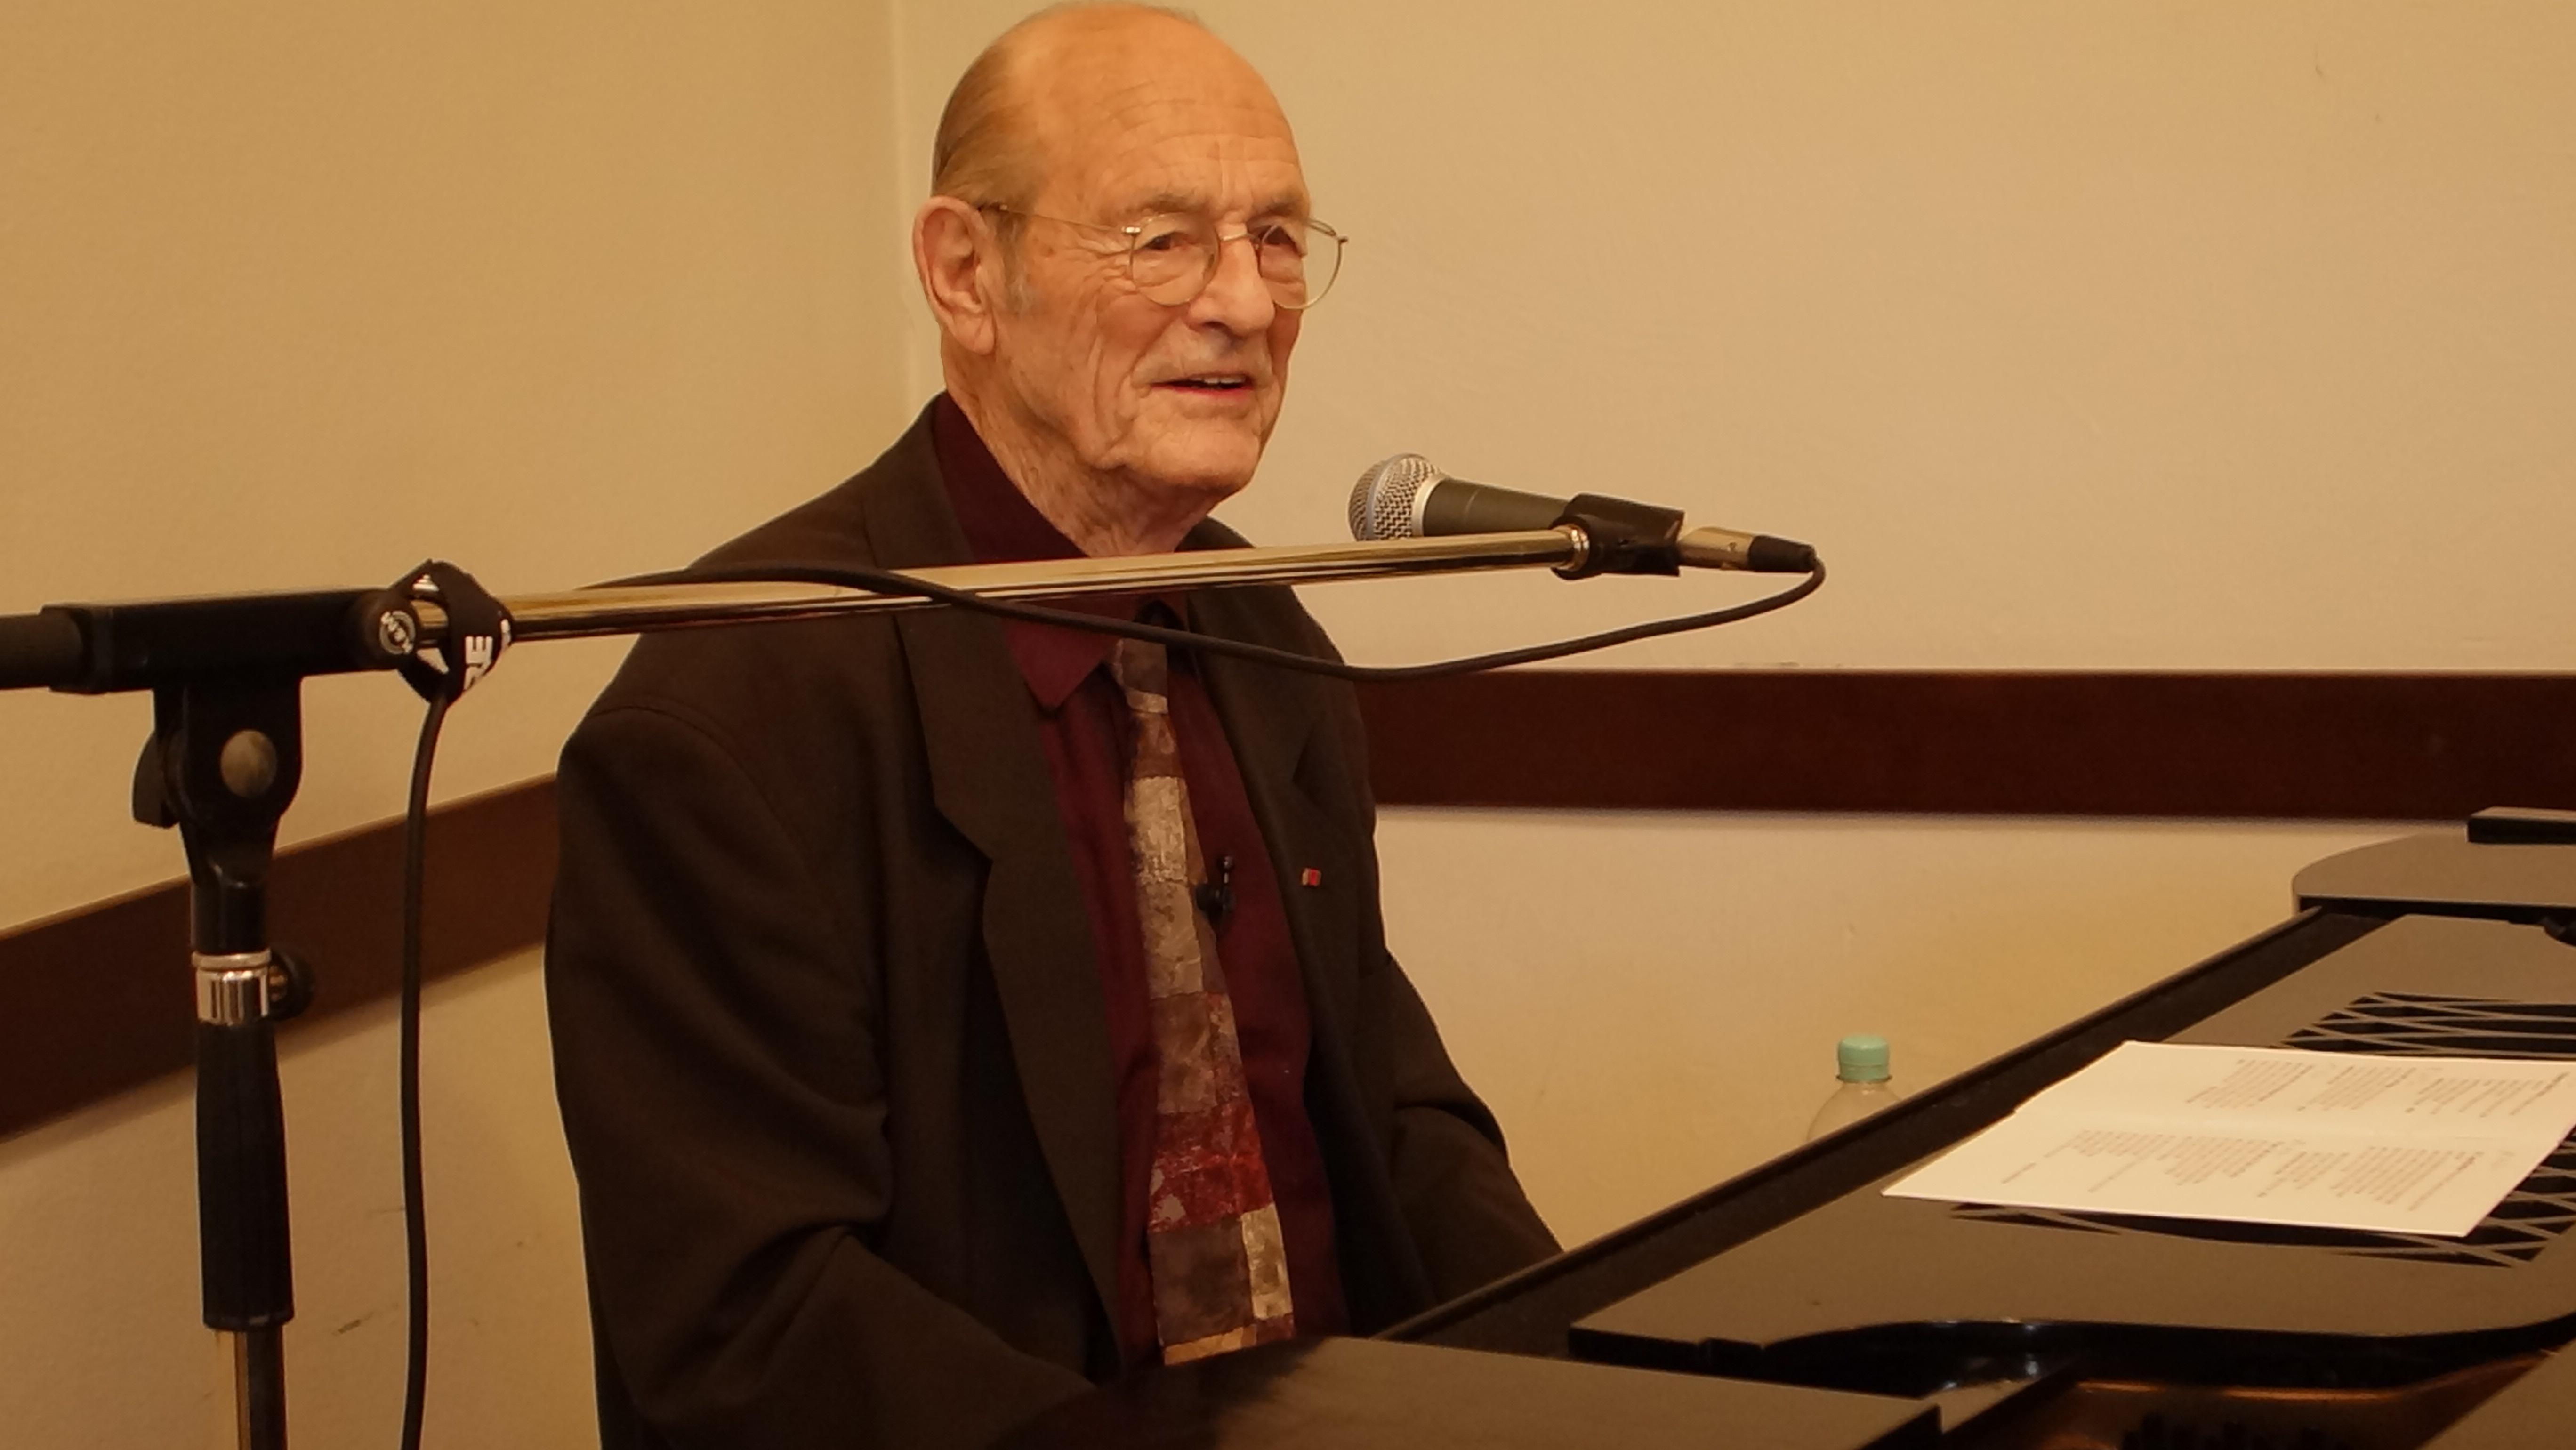 Klaus Wüsthoff - Der Komponist